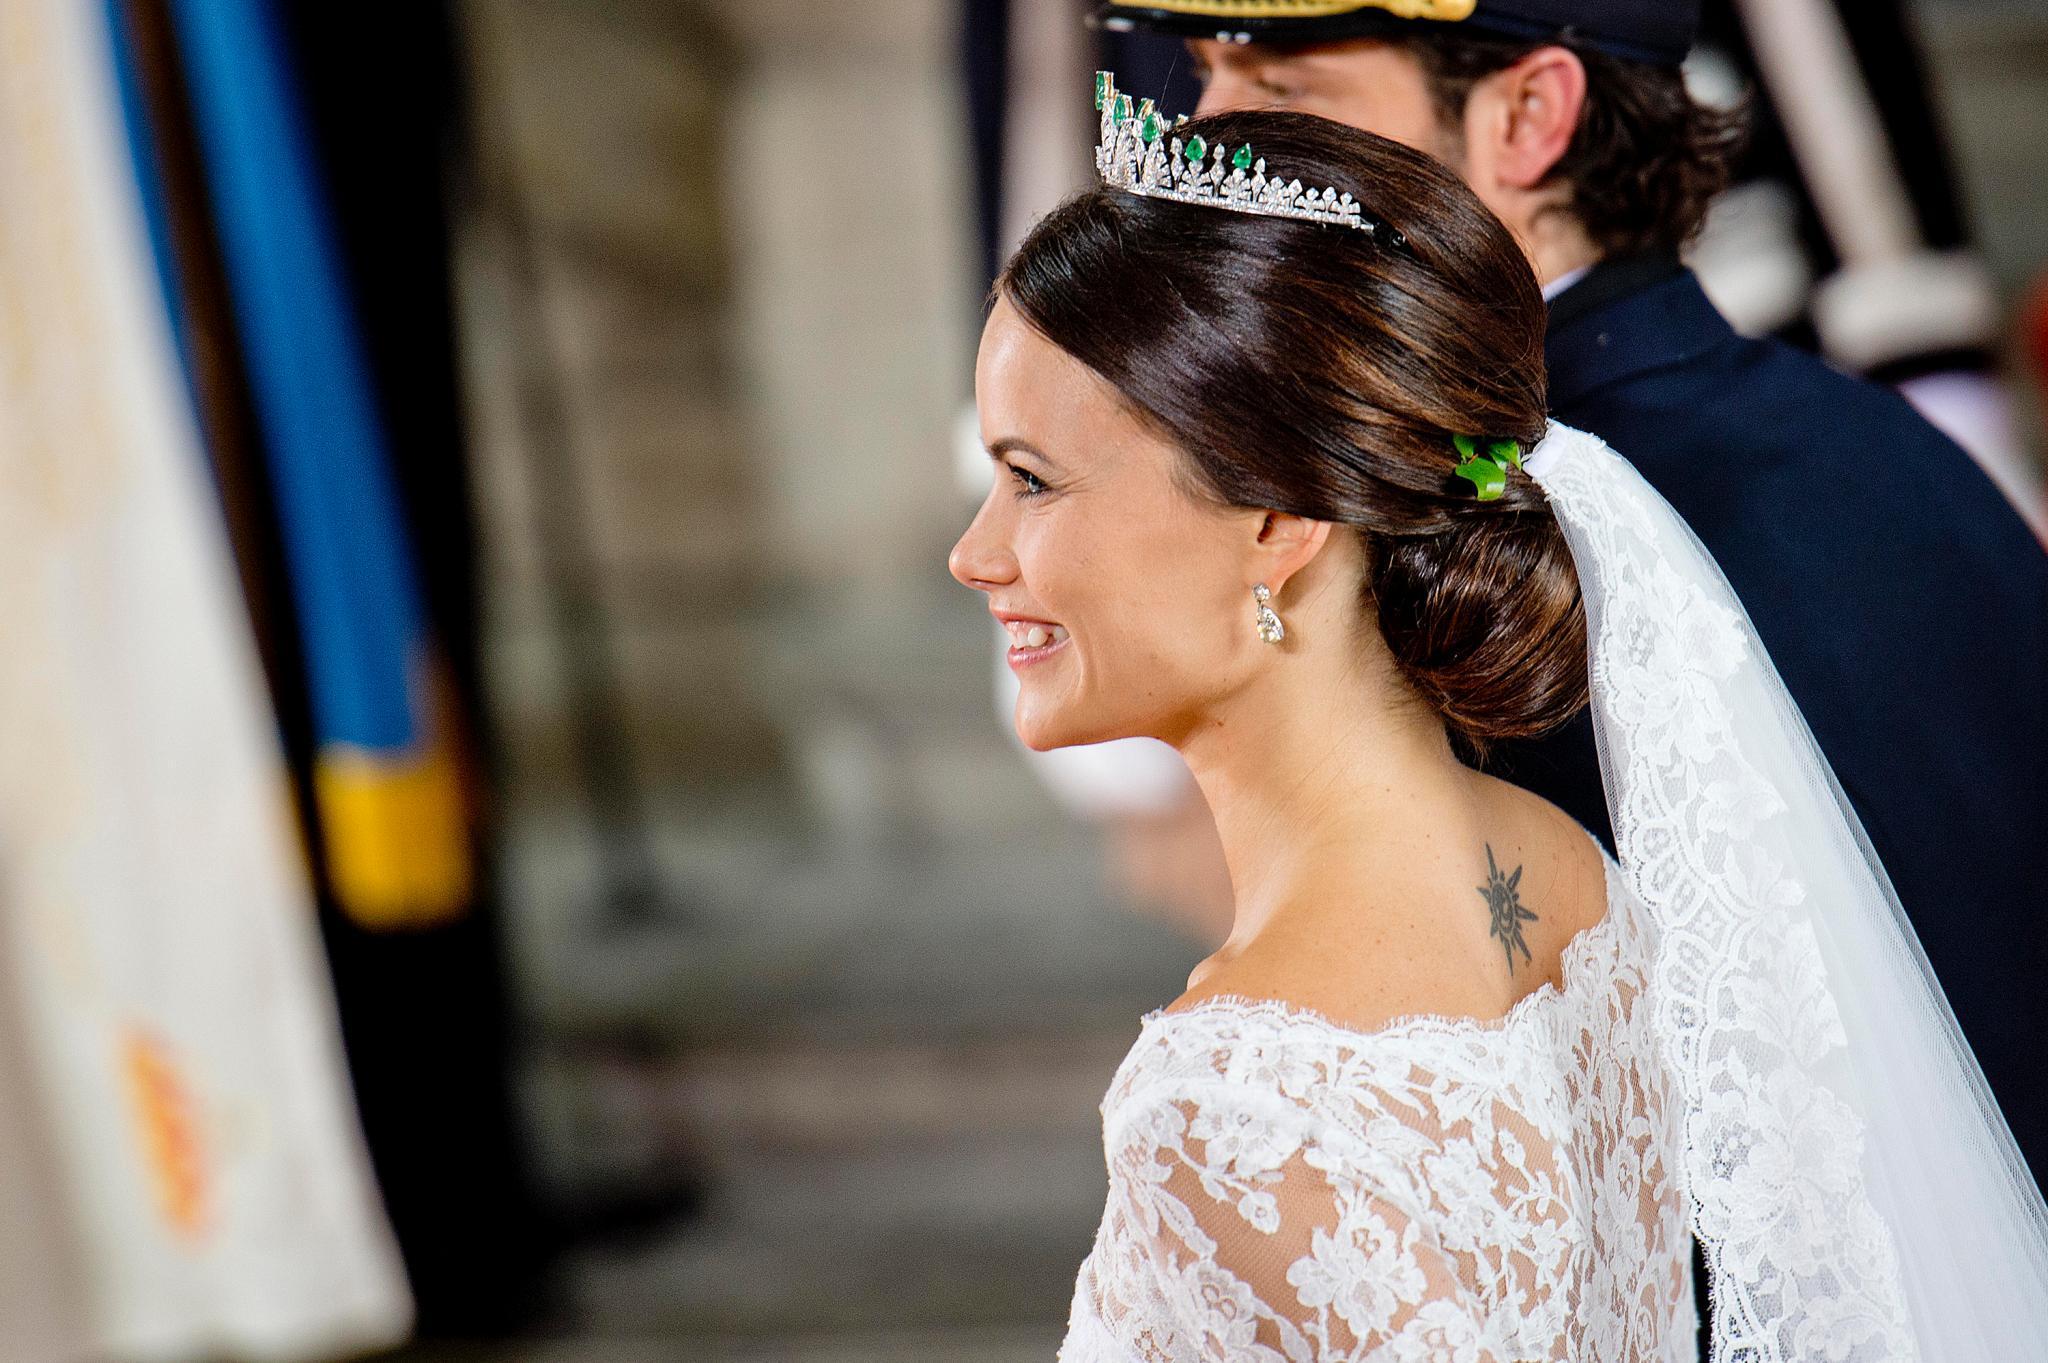 Kate vs Sofia: Welche Braut war schöner? | GALA.de